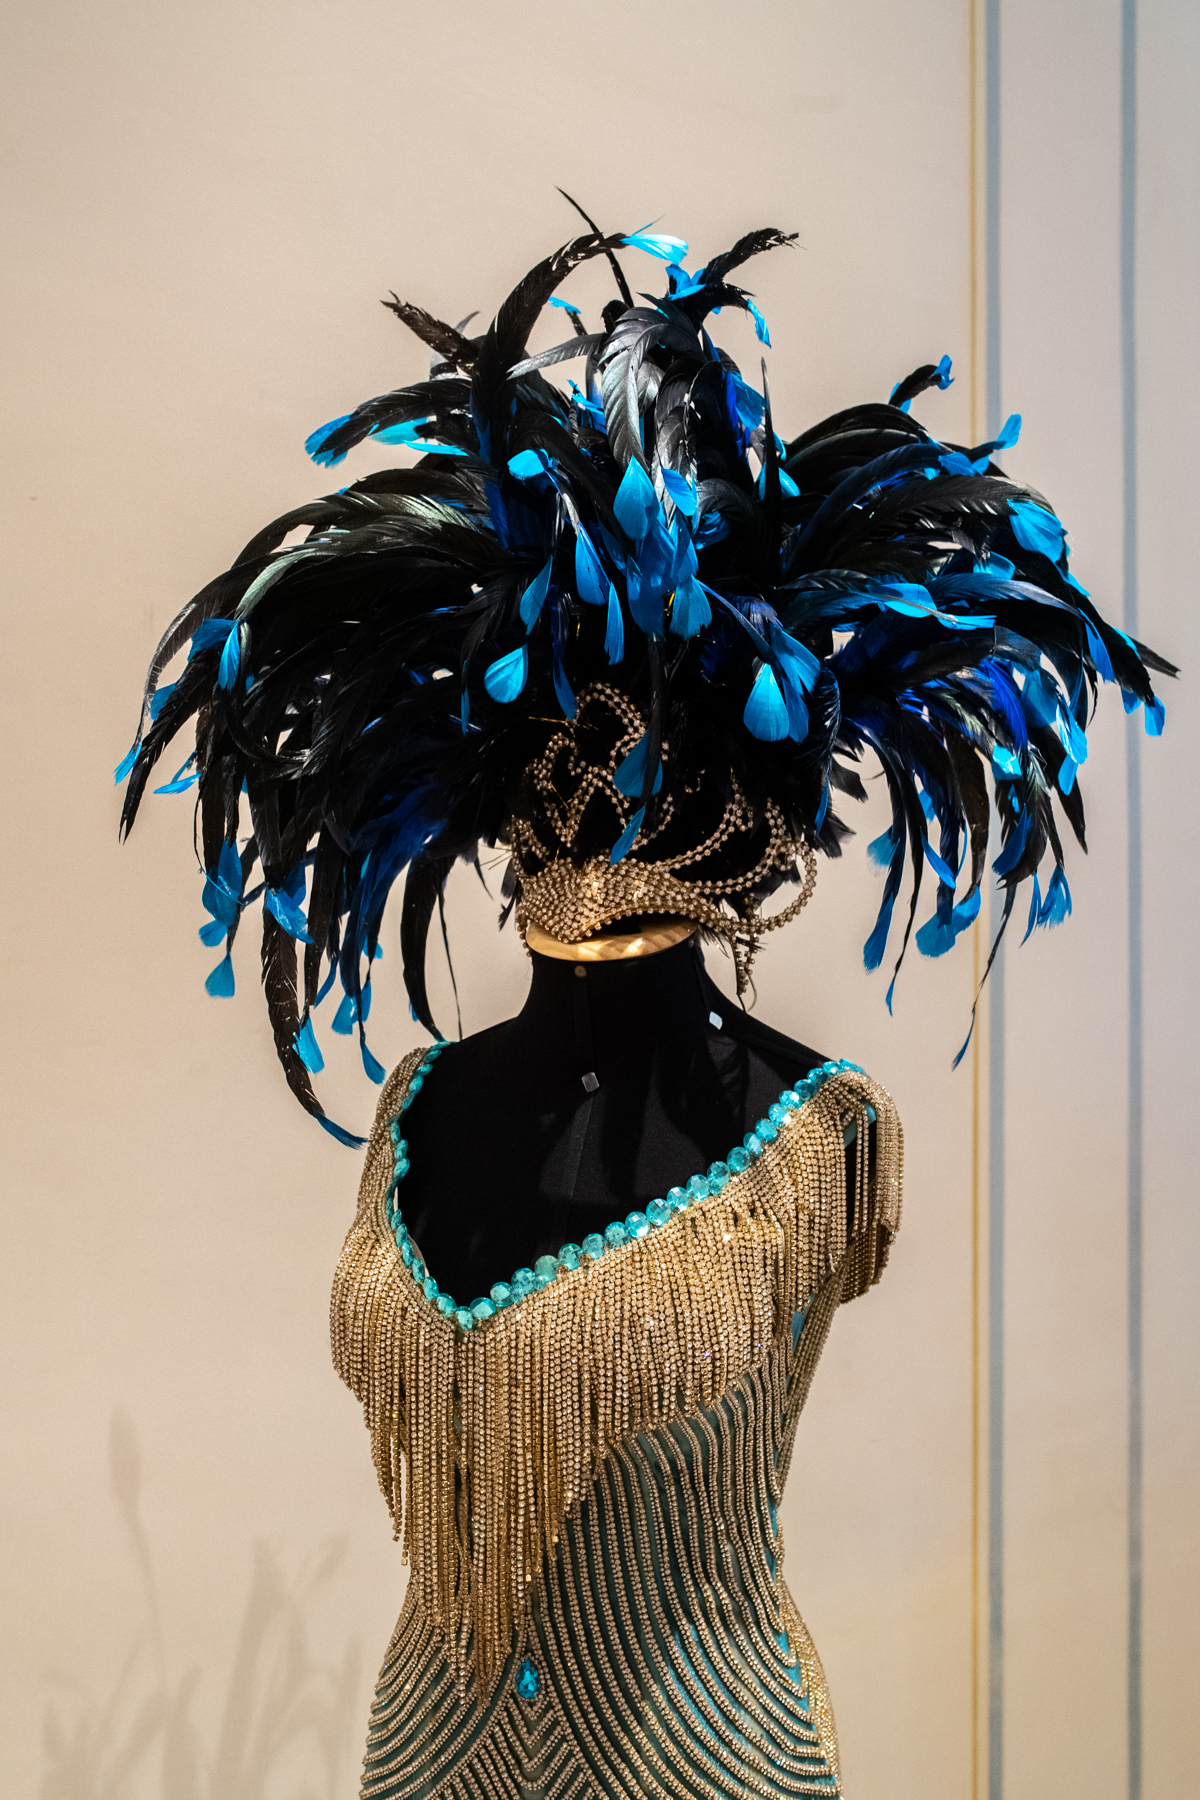 Stacie Flinner x Belmond Copacabana Carnival Ball-4.jpg